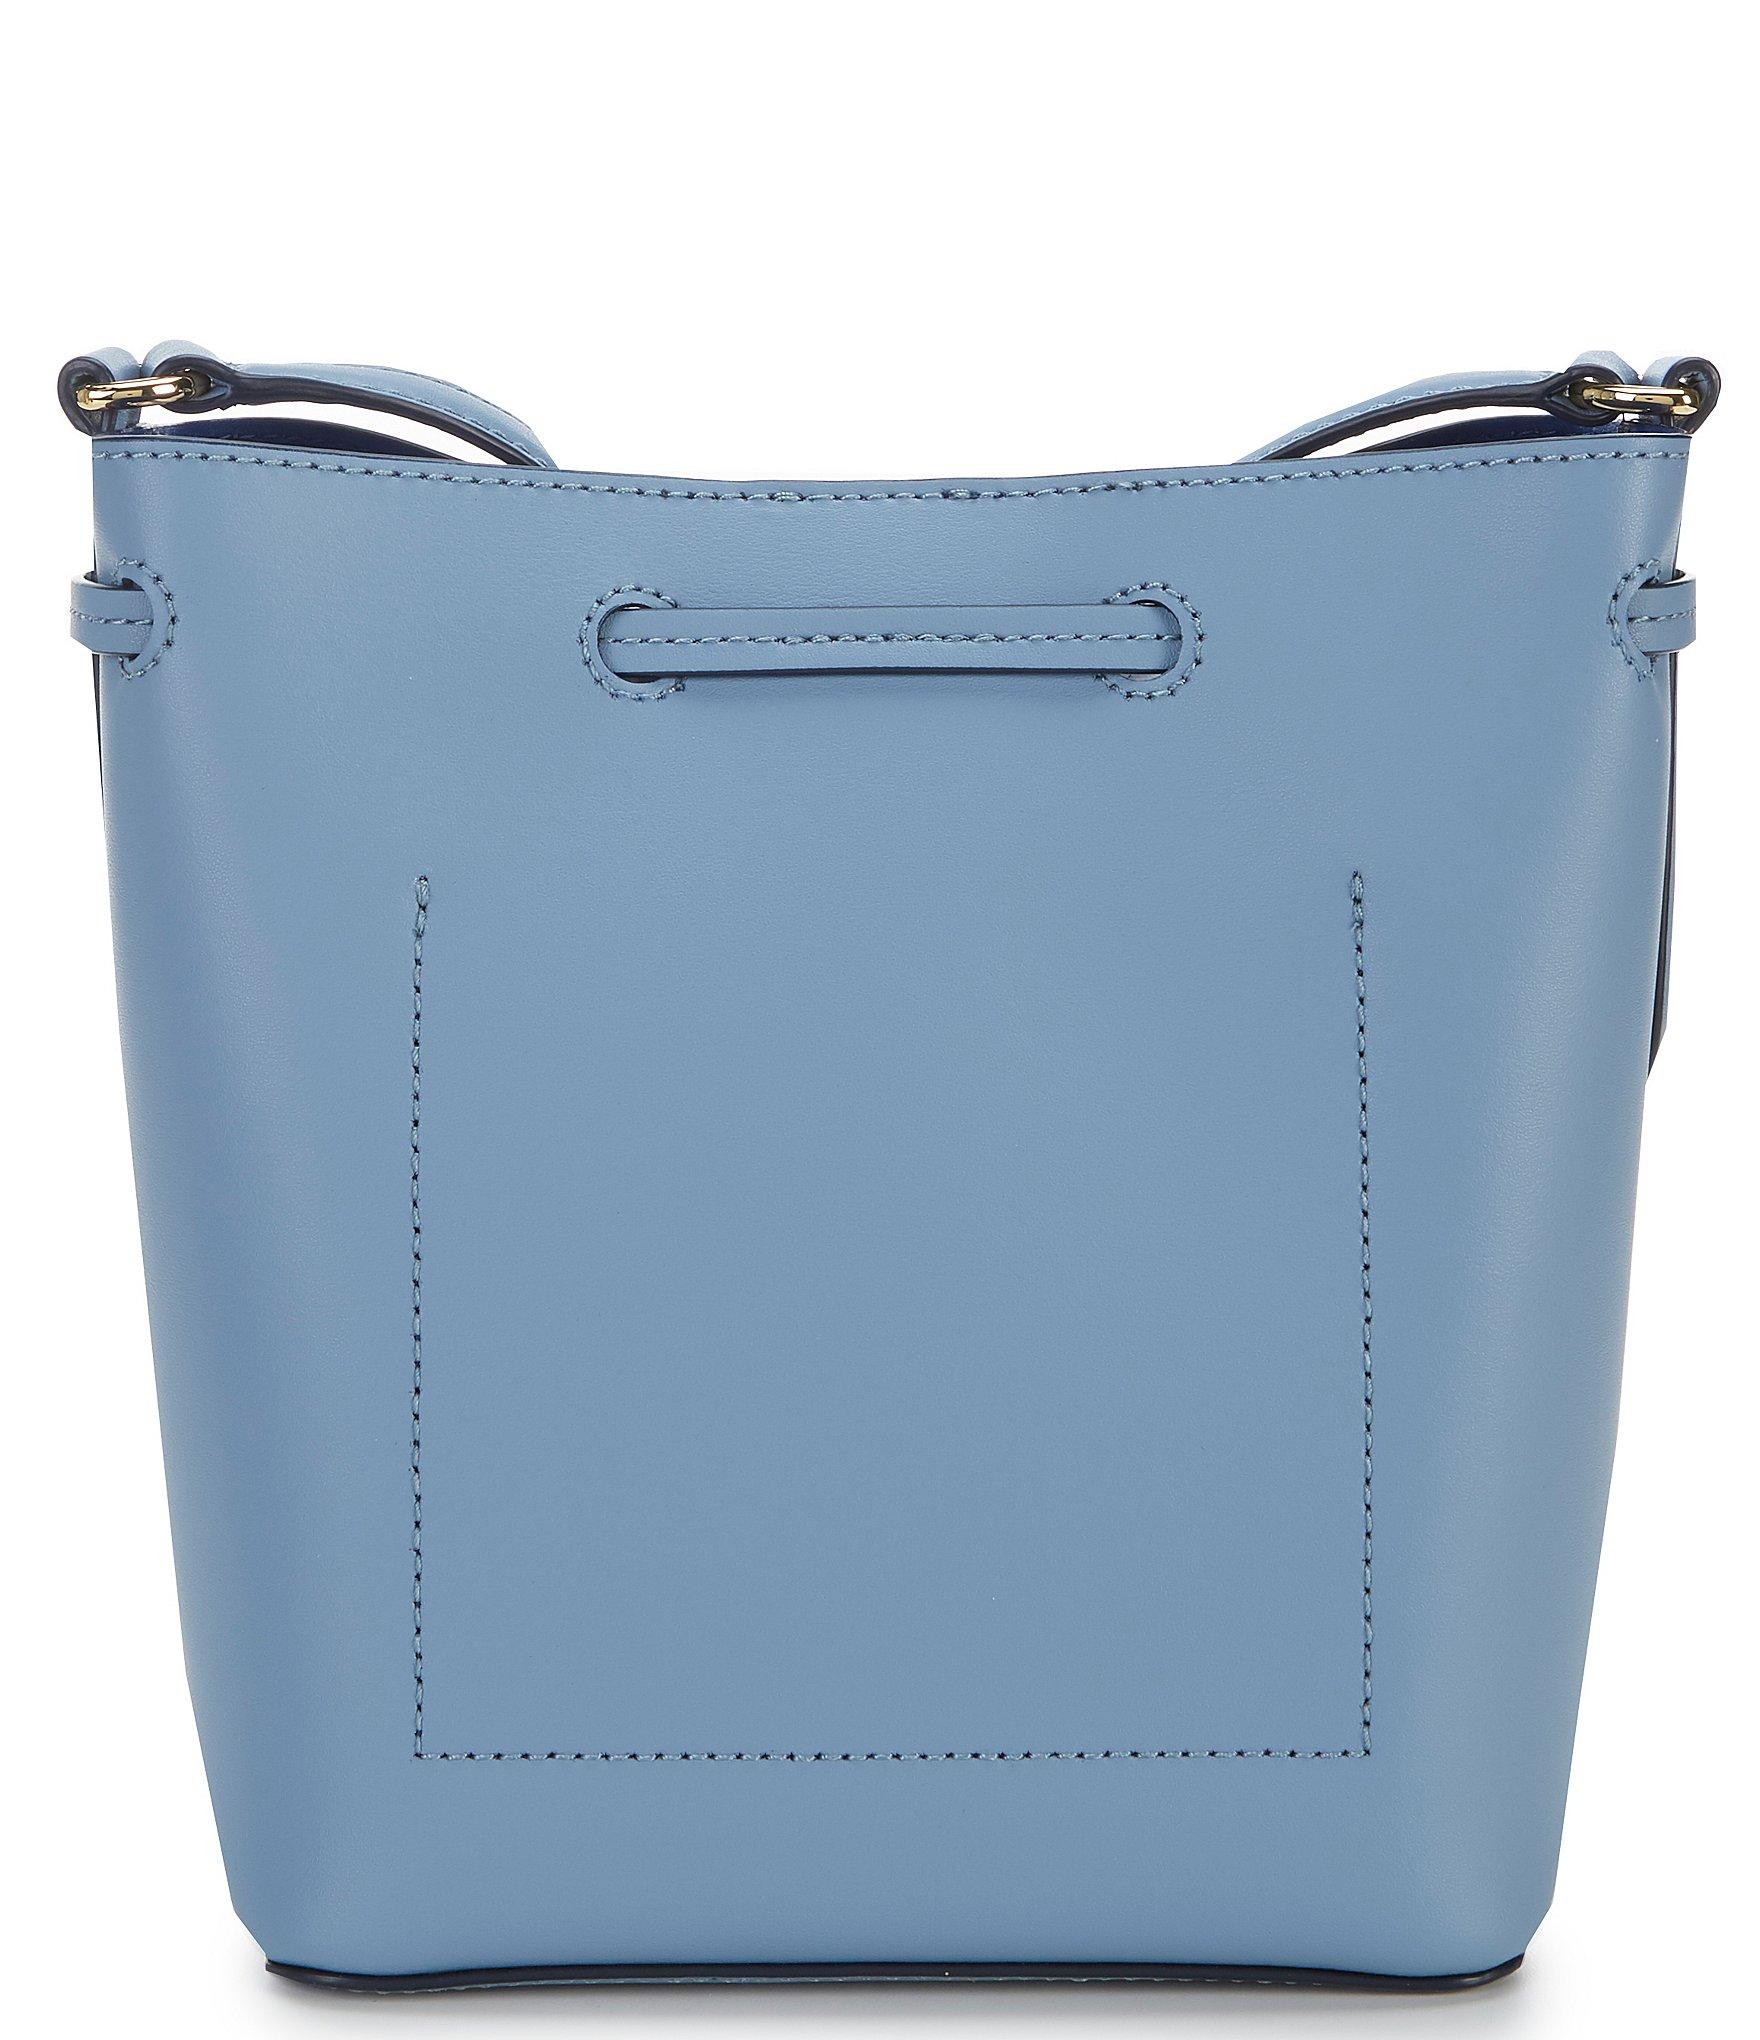 4a549e2681 Lauren by Ralph Lauren Debby Ii Mini Leather Drawstring Bag in Blue ...